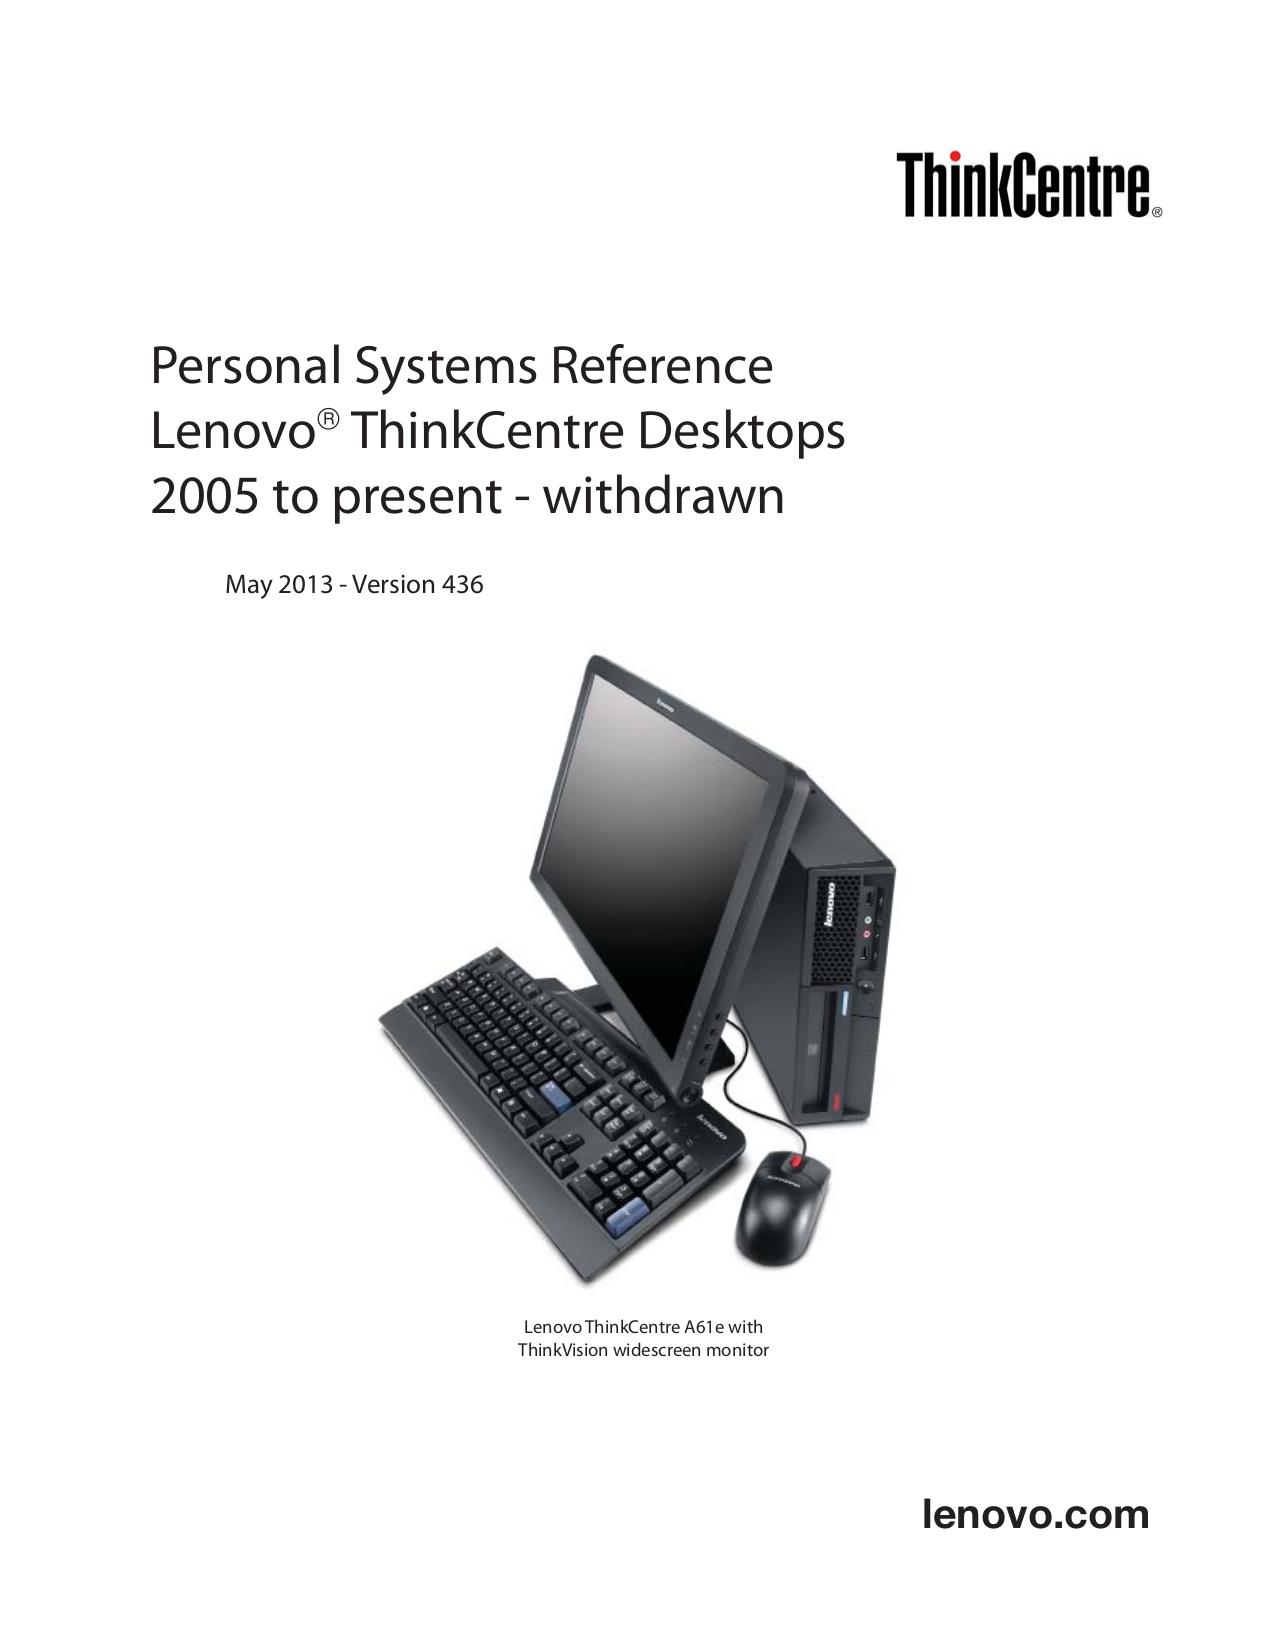 pdf for Lenovo Desktop ThinkCentre M57e 6177 manual